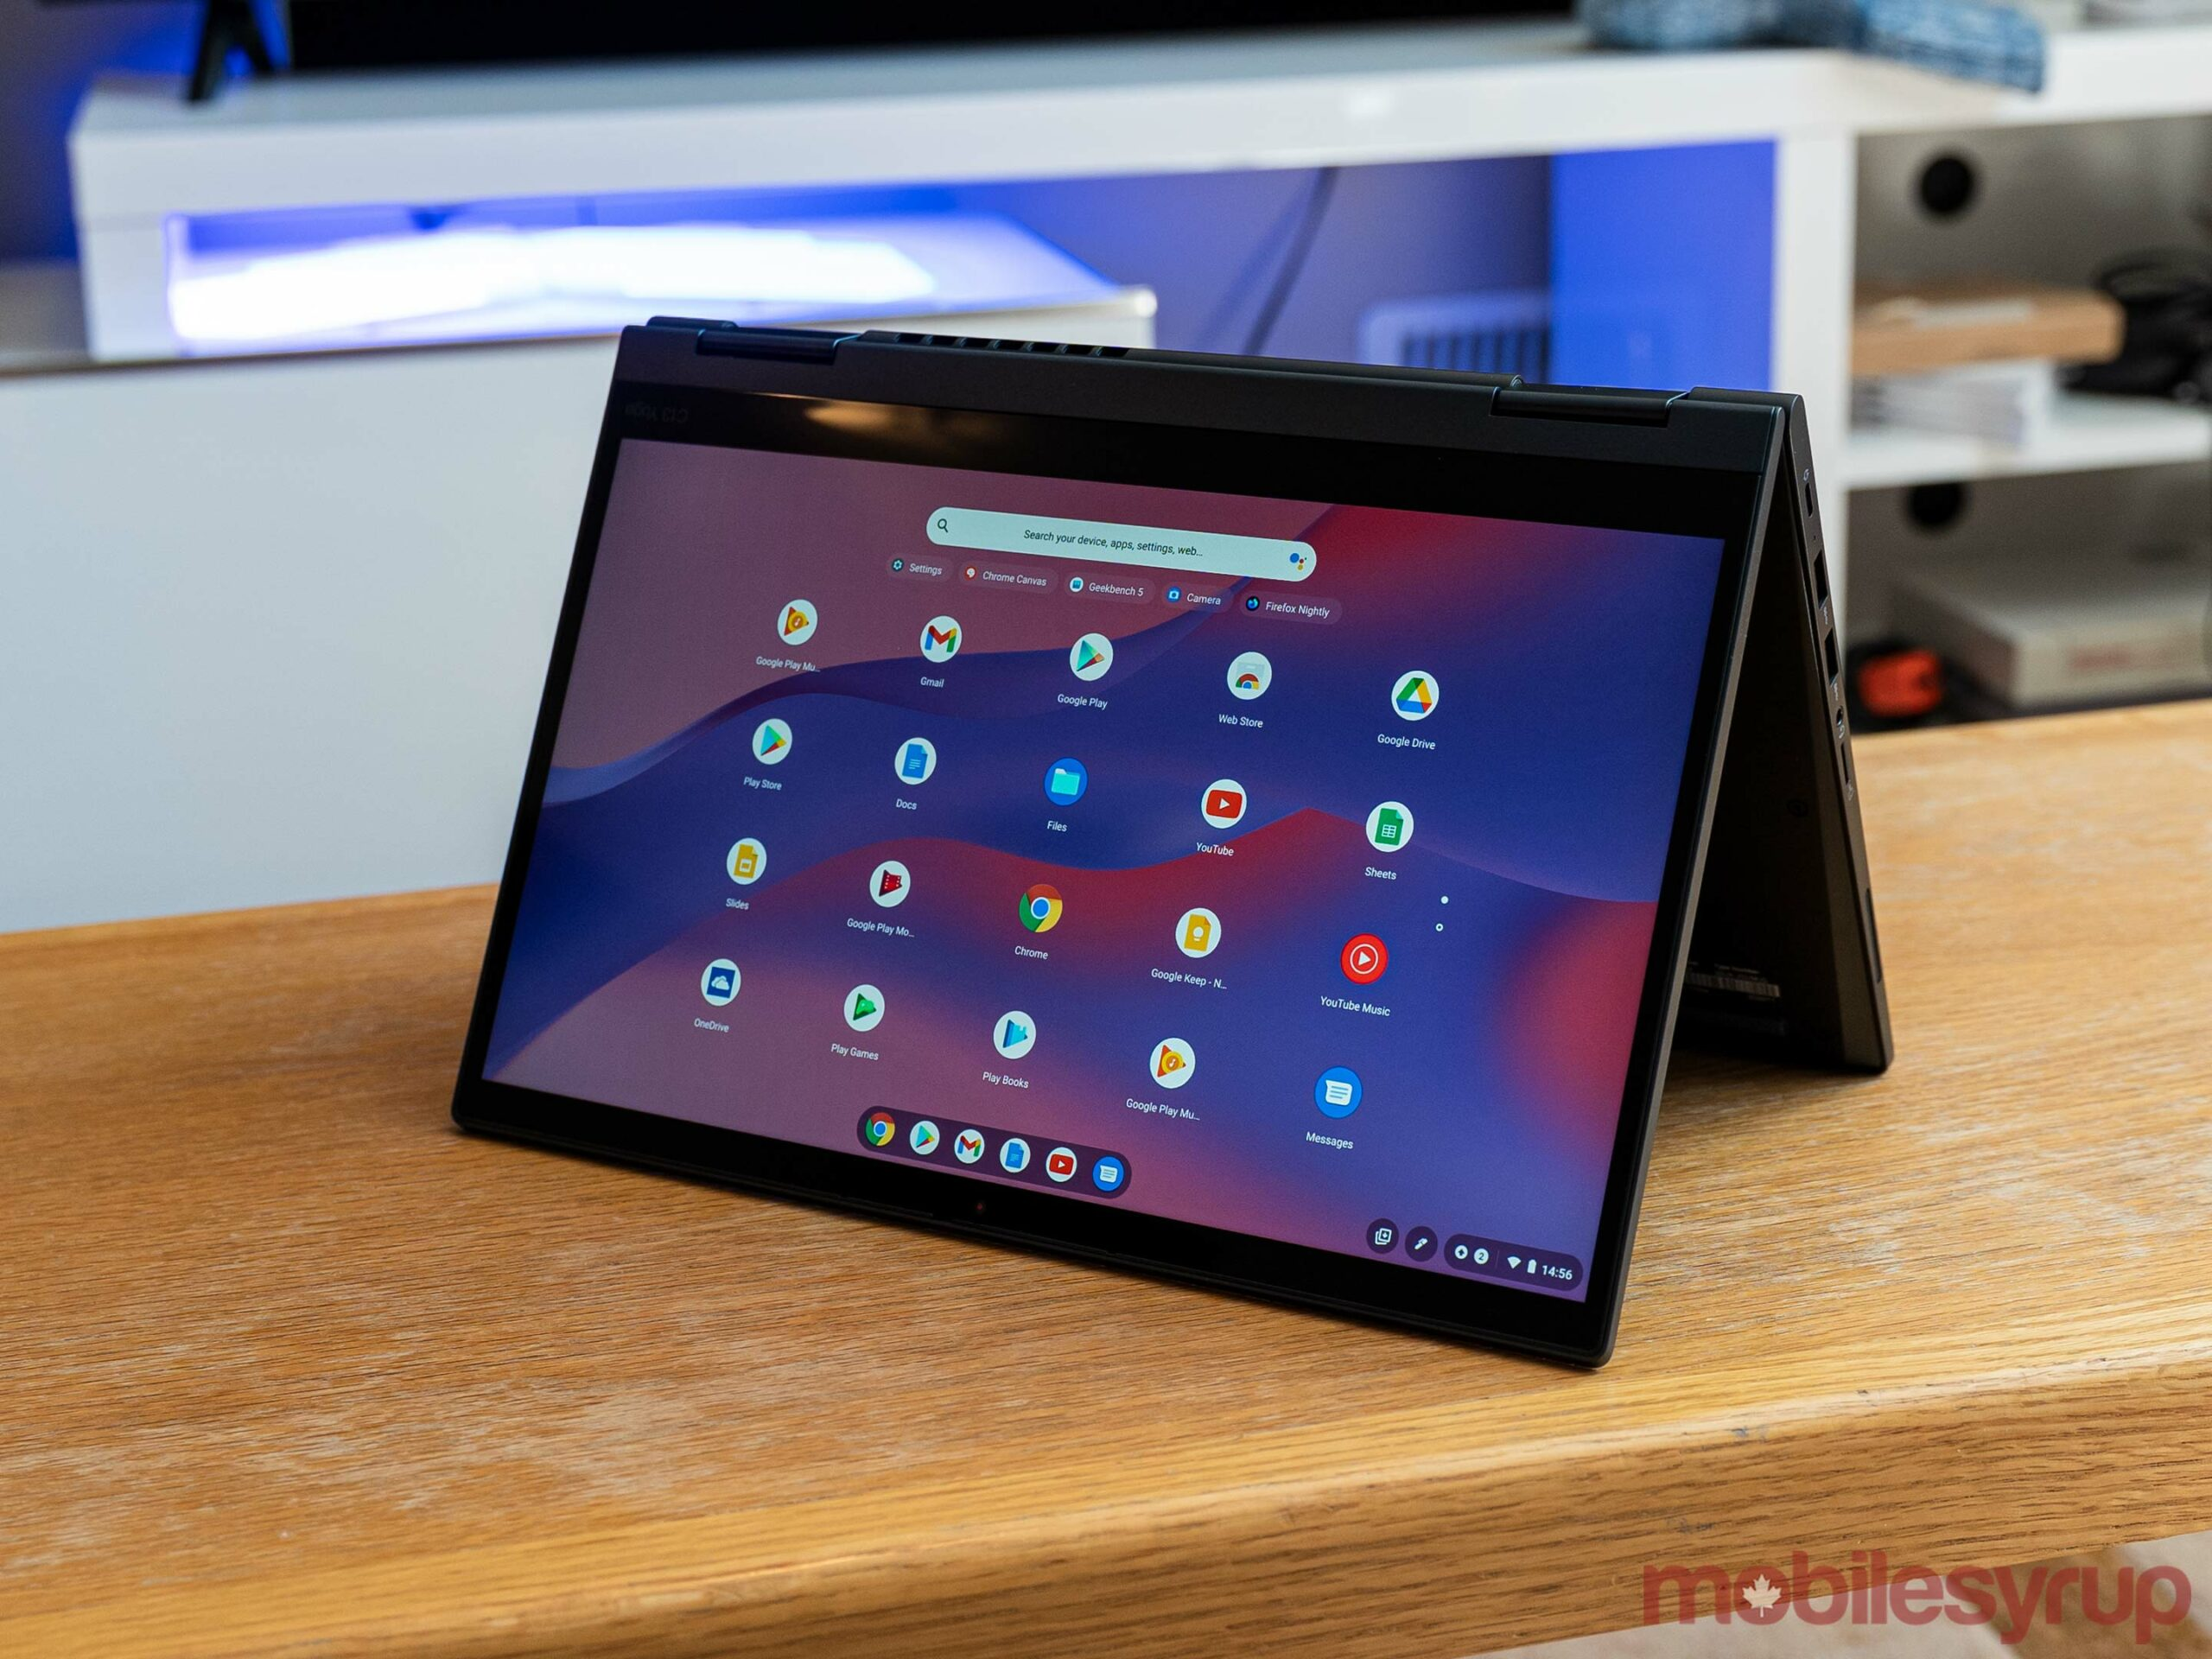 Lenovo ThinkPad C13 Yoga Gen 1 in tent mode